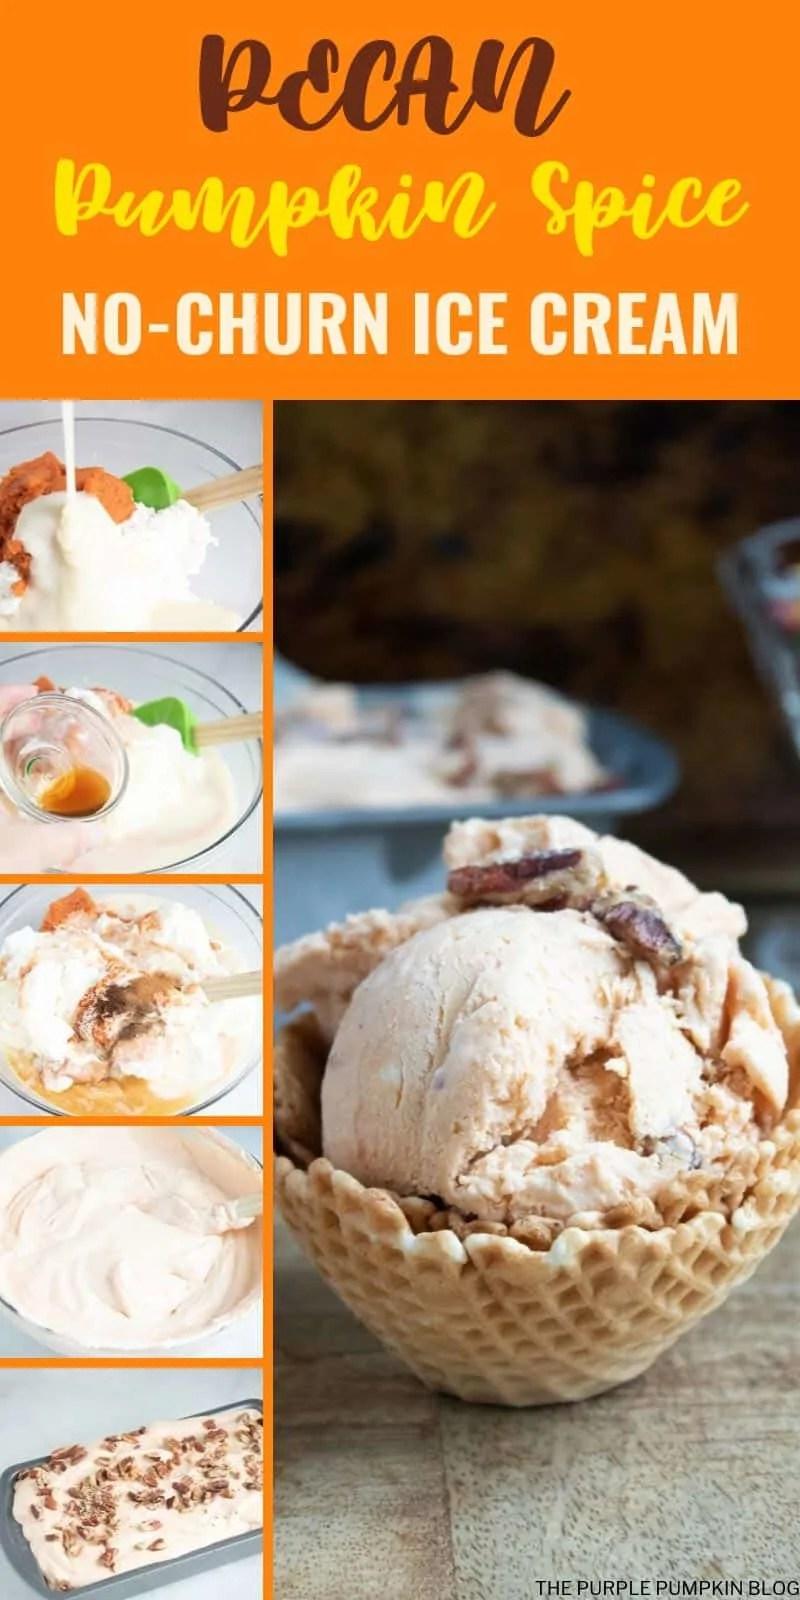 How to make Pecan Pumpkin Spice No-Churn Ice Cream